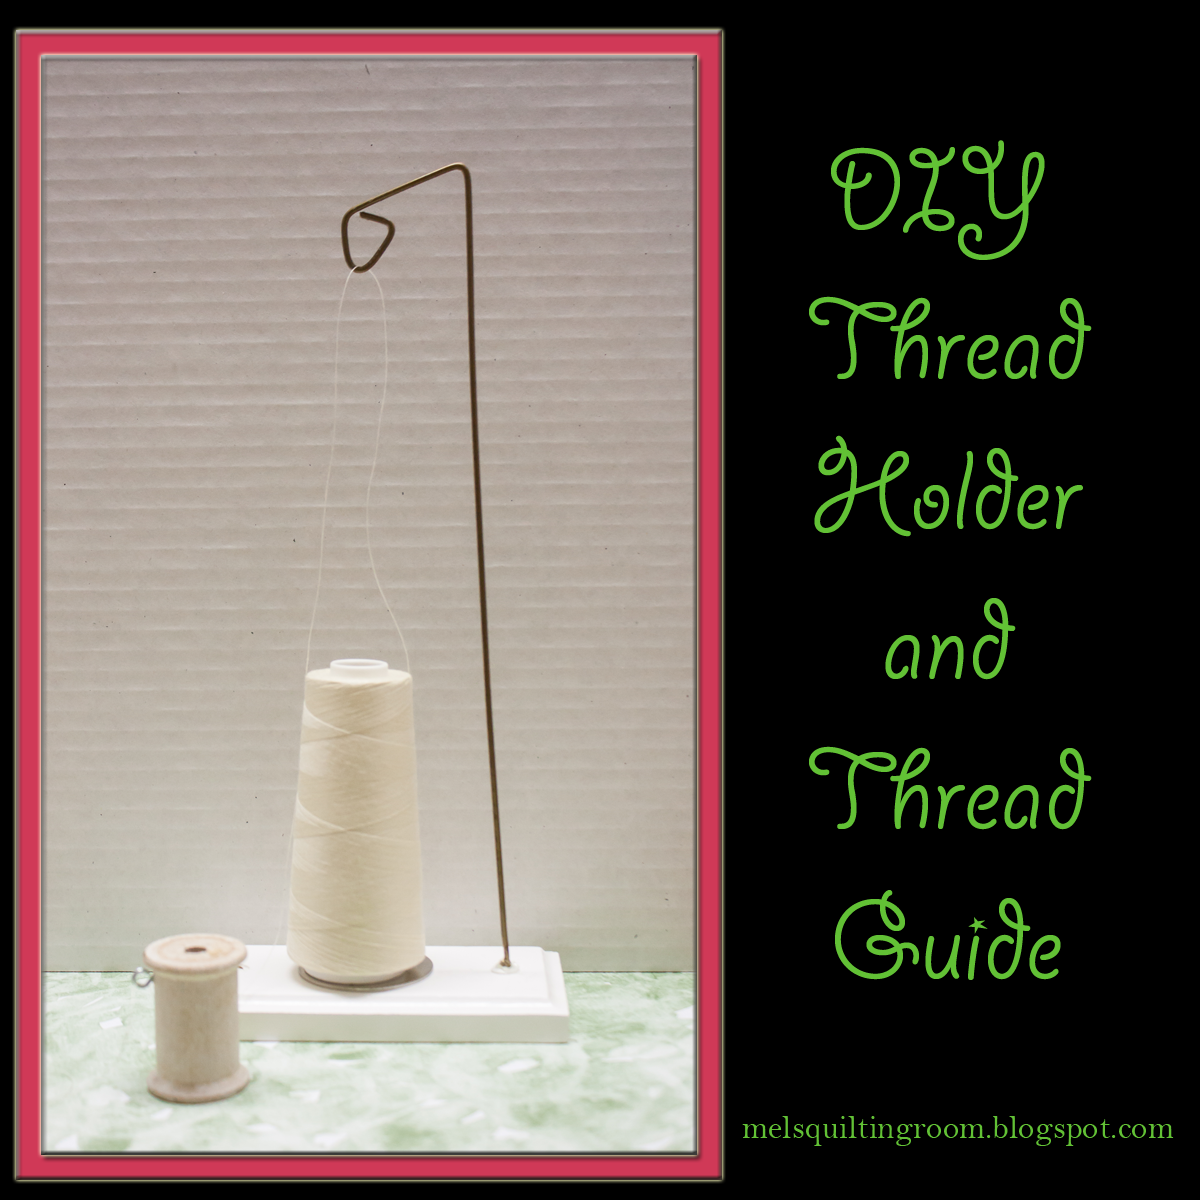 DIY Cone Thread Holder and Thread Guide